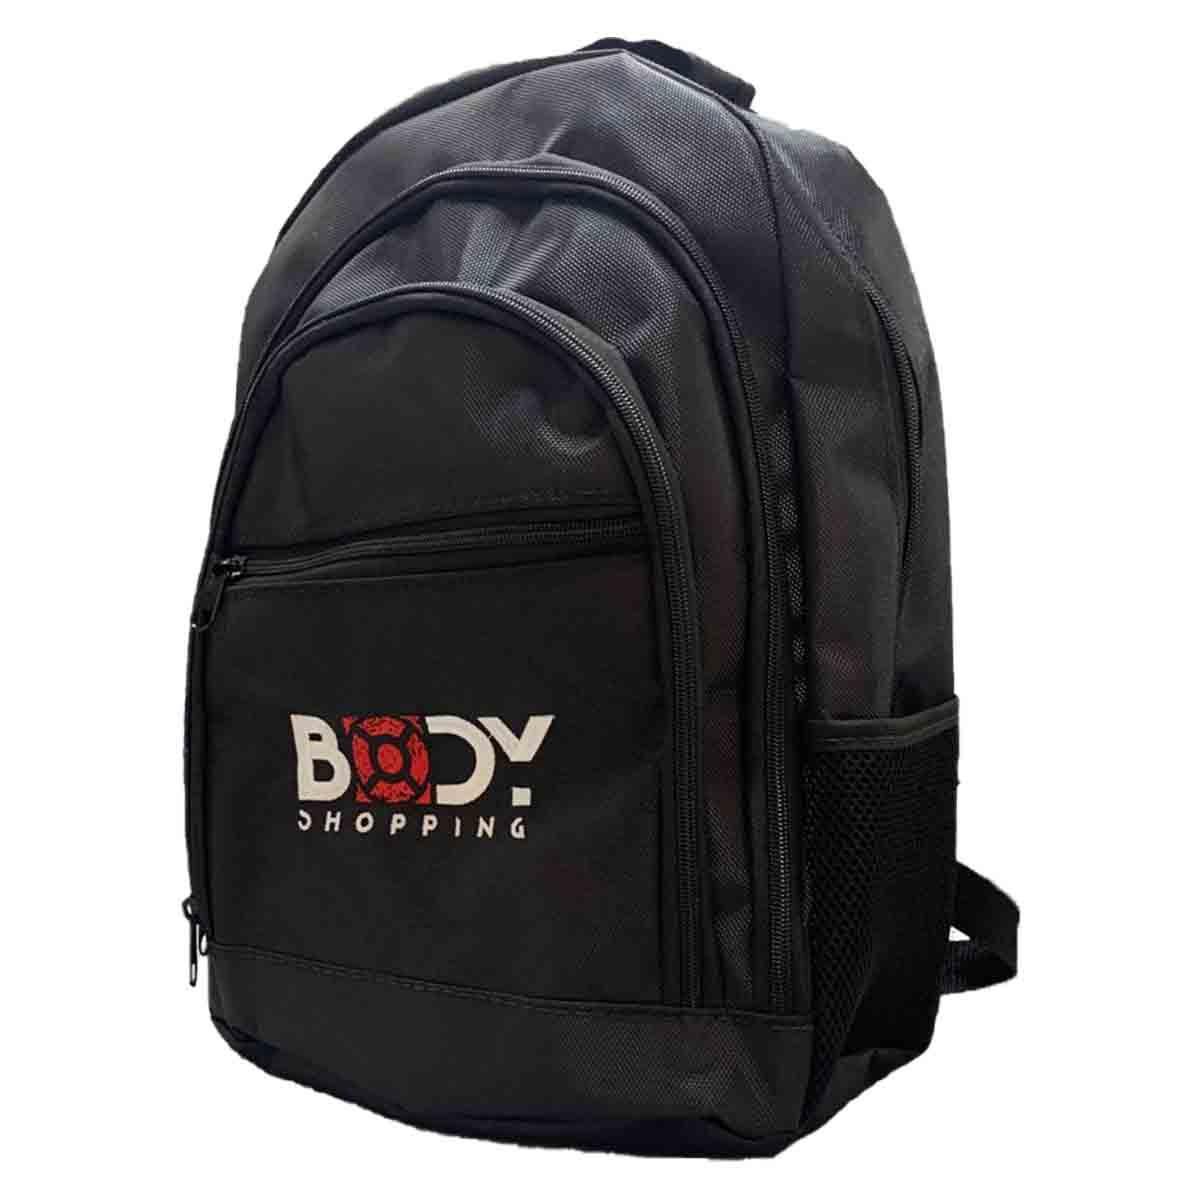 Mochila Notebook - Body Shopping